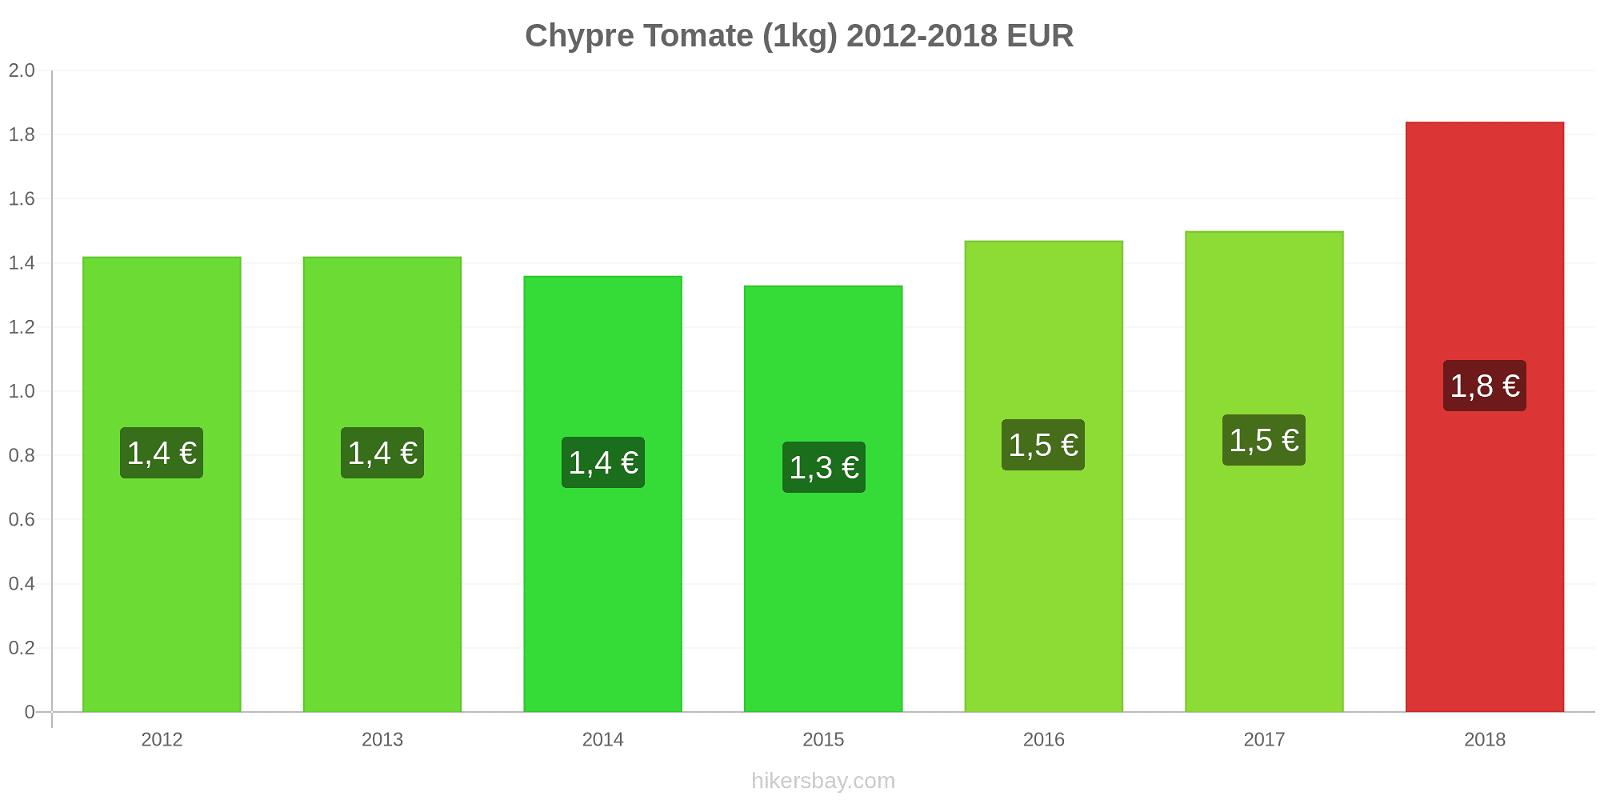 Chypre changements de prix Tomate (1kg) hikersbay.com